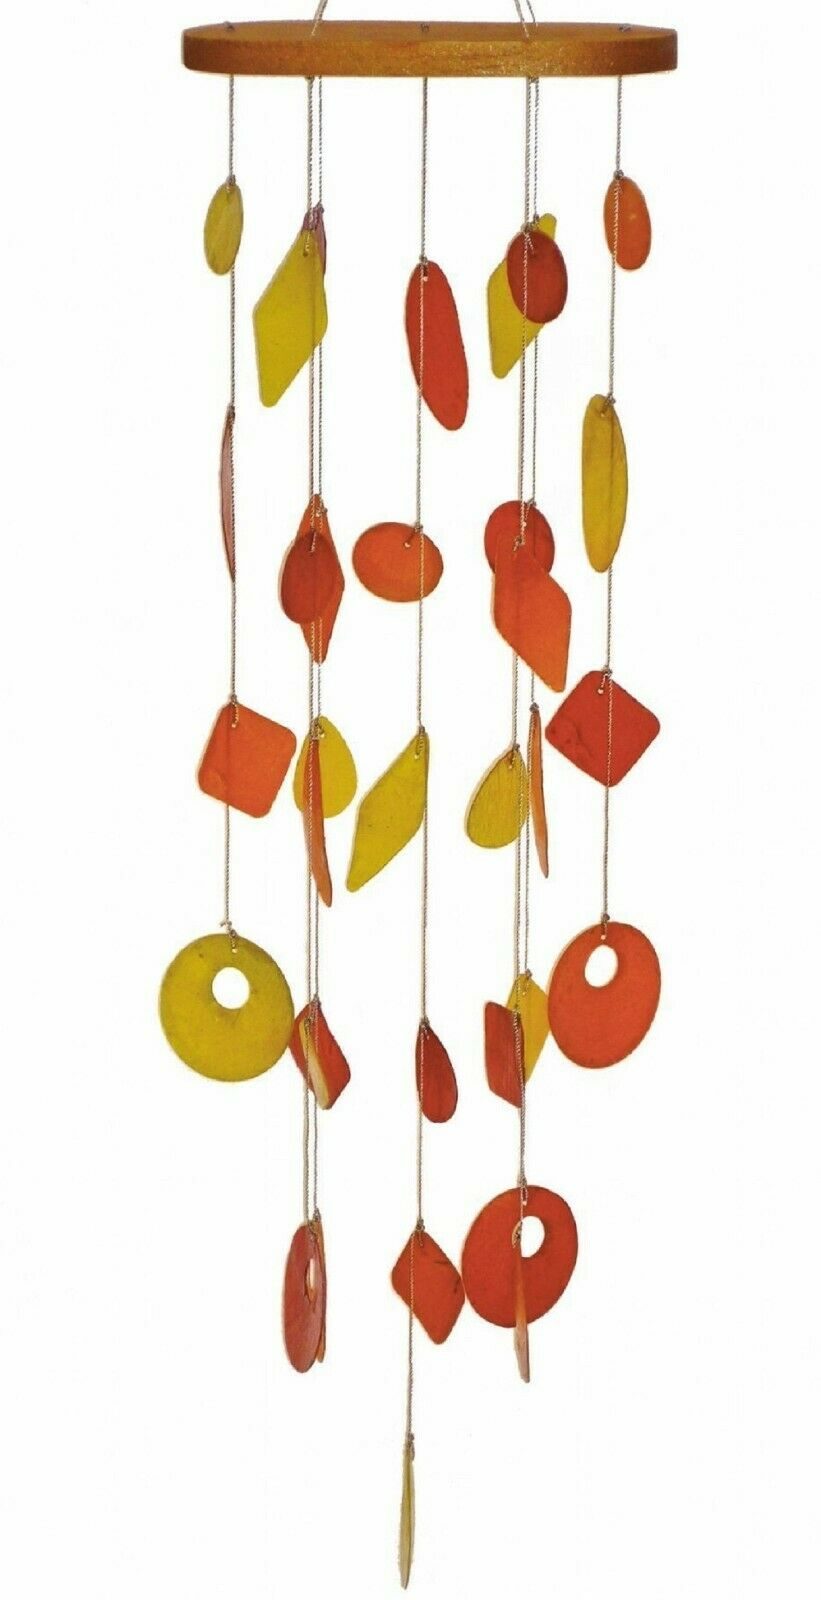 Capiz Shell Wind Chime Patio Garden Decor Window Suncatcher Orange Yellow